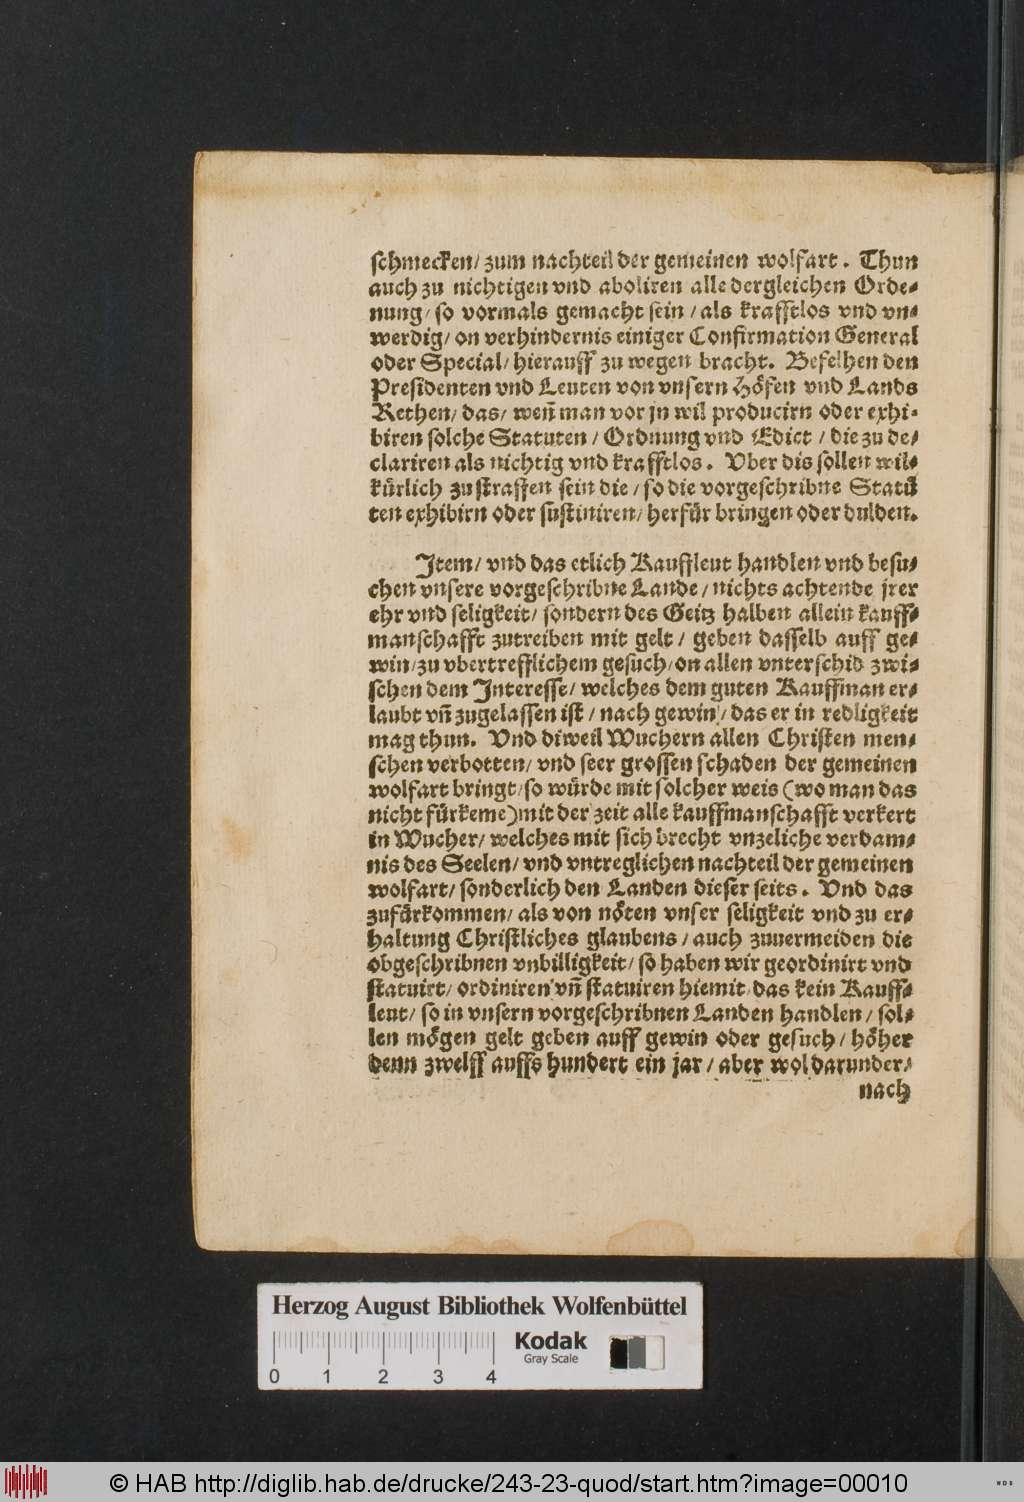 http://diglib.hab.de/drucke/243-23-quod/00010.jpg